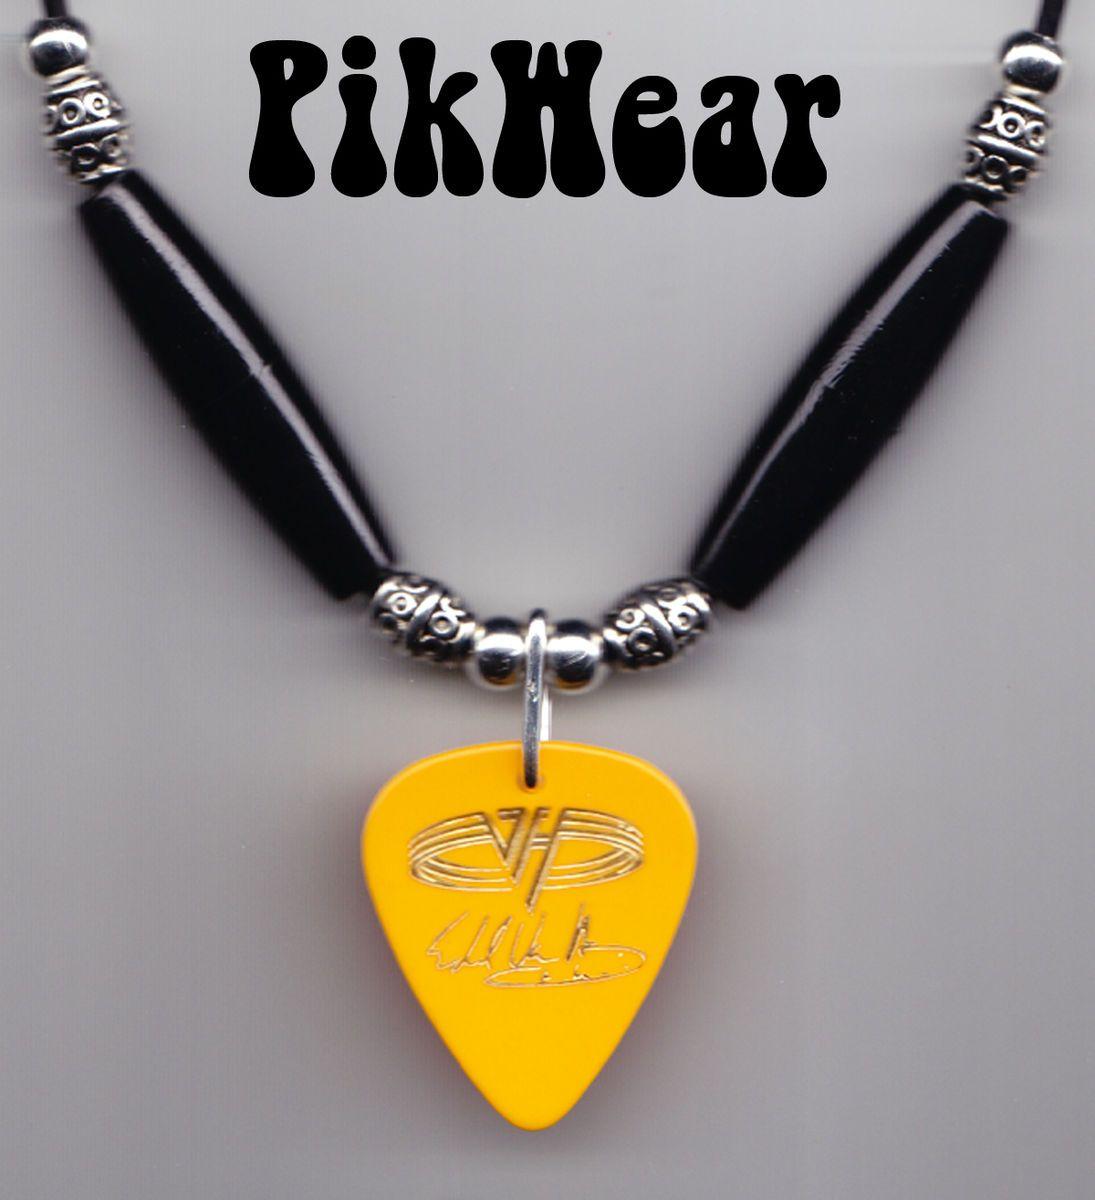 eddie van halen signature yellow guitar pick necklace 1995 balance. Black Bedroom Furniture Sets. Home Design Ideas